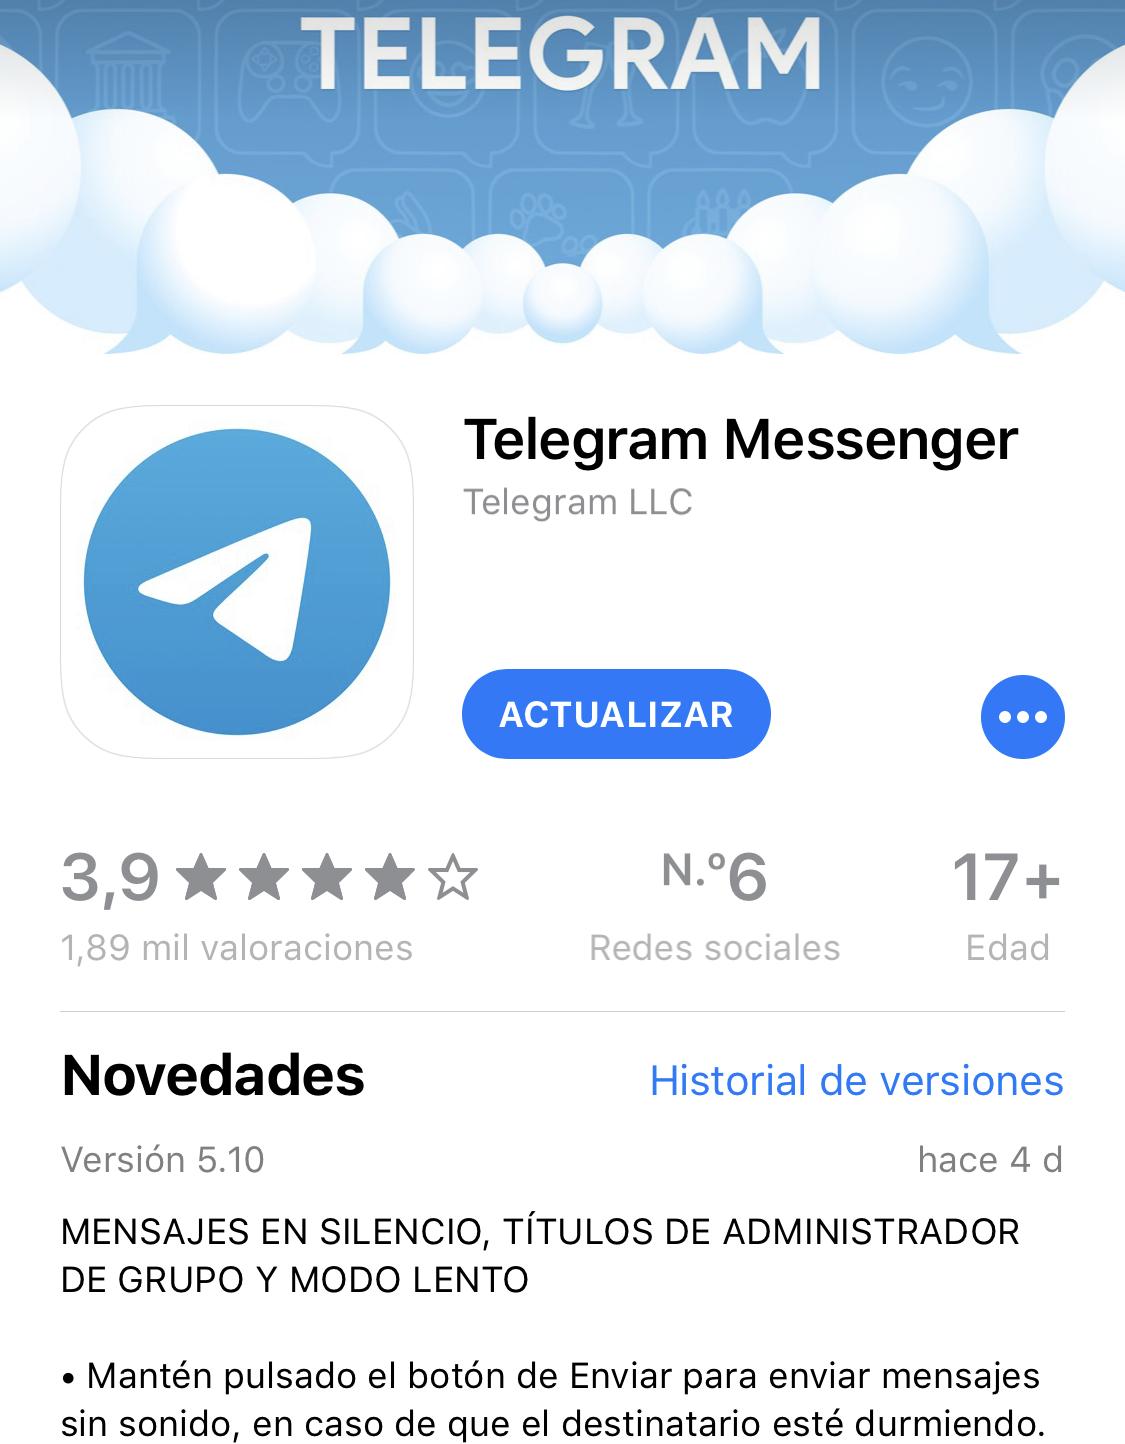 Version 5.10 de Telegram